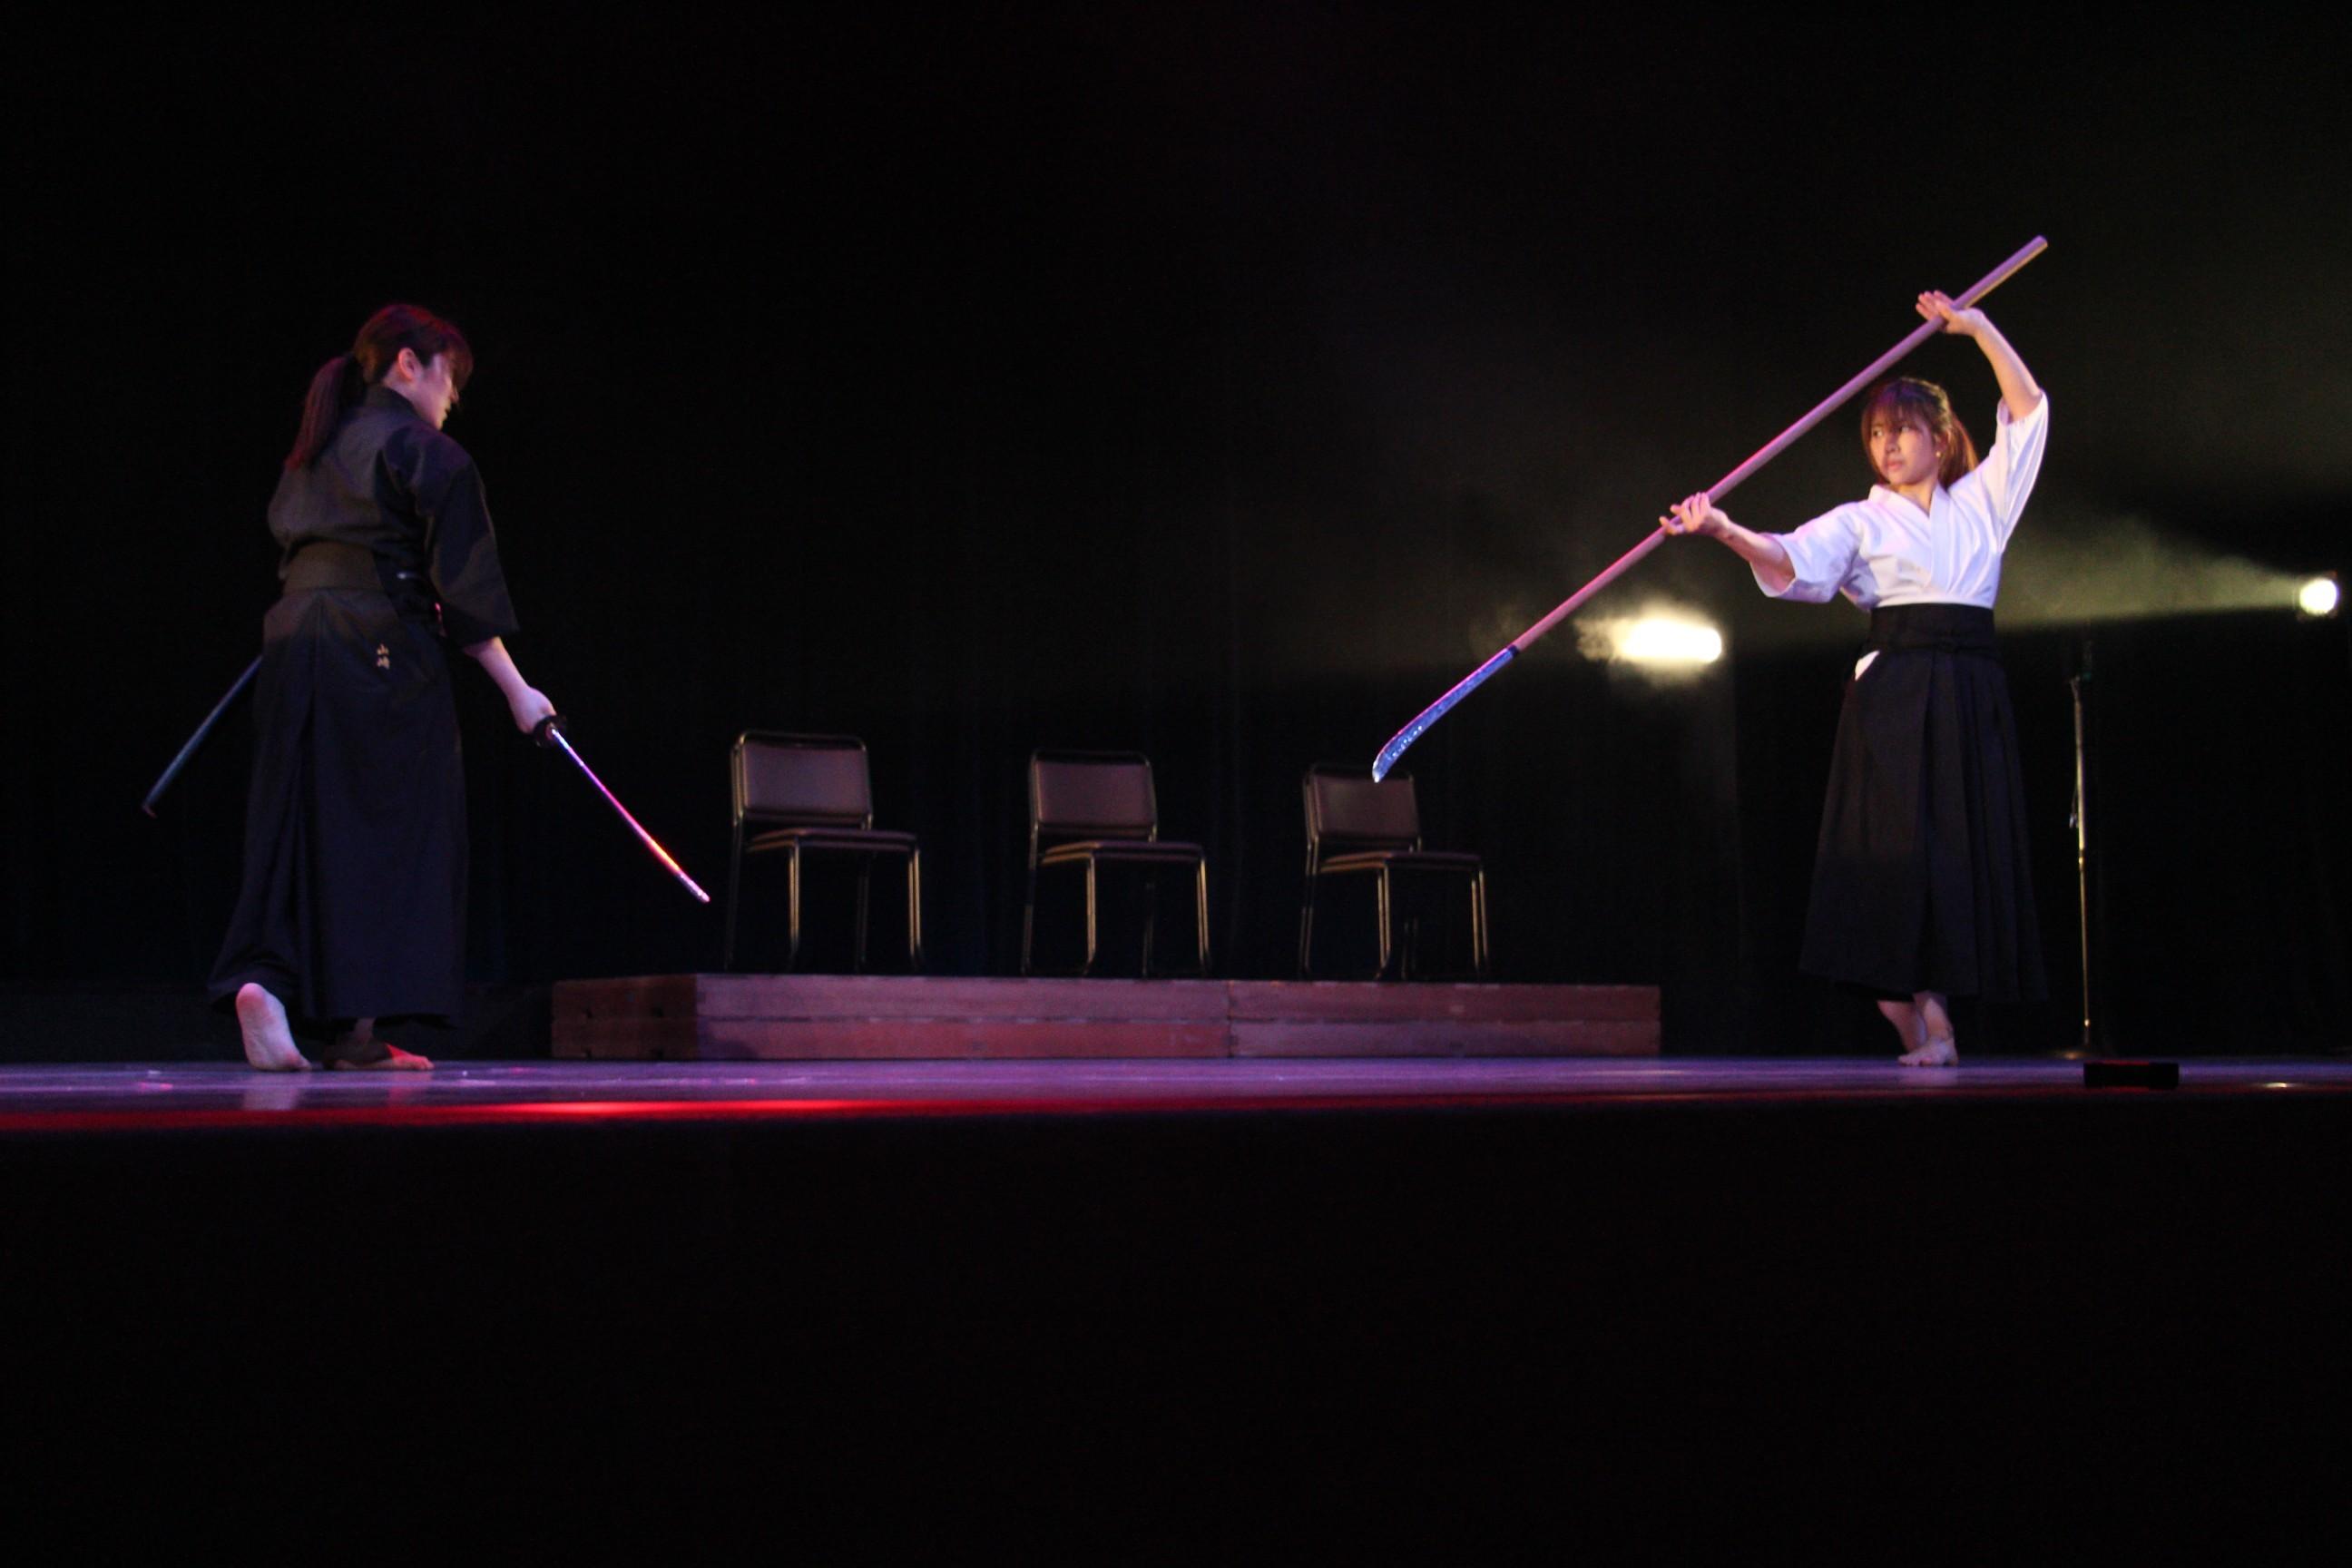 JAE所属のスタントマンらによる演舞も行われた